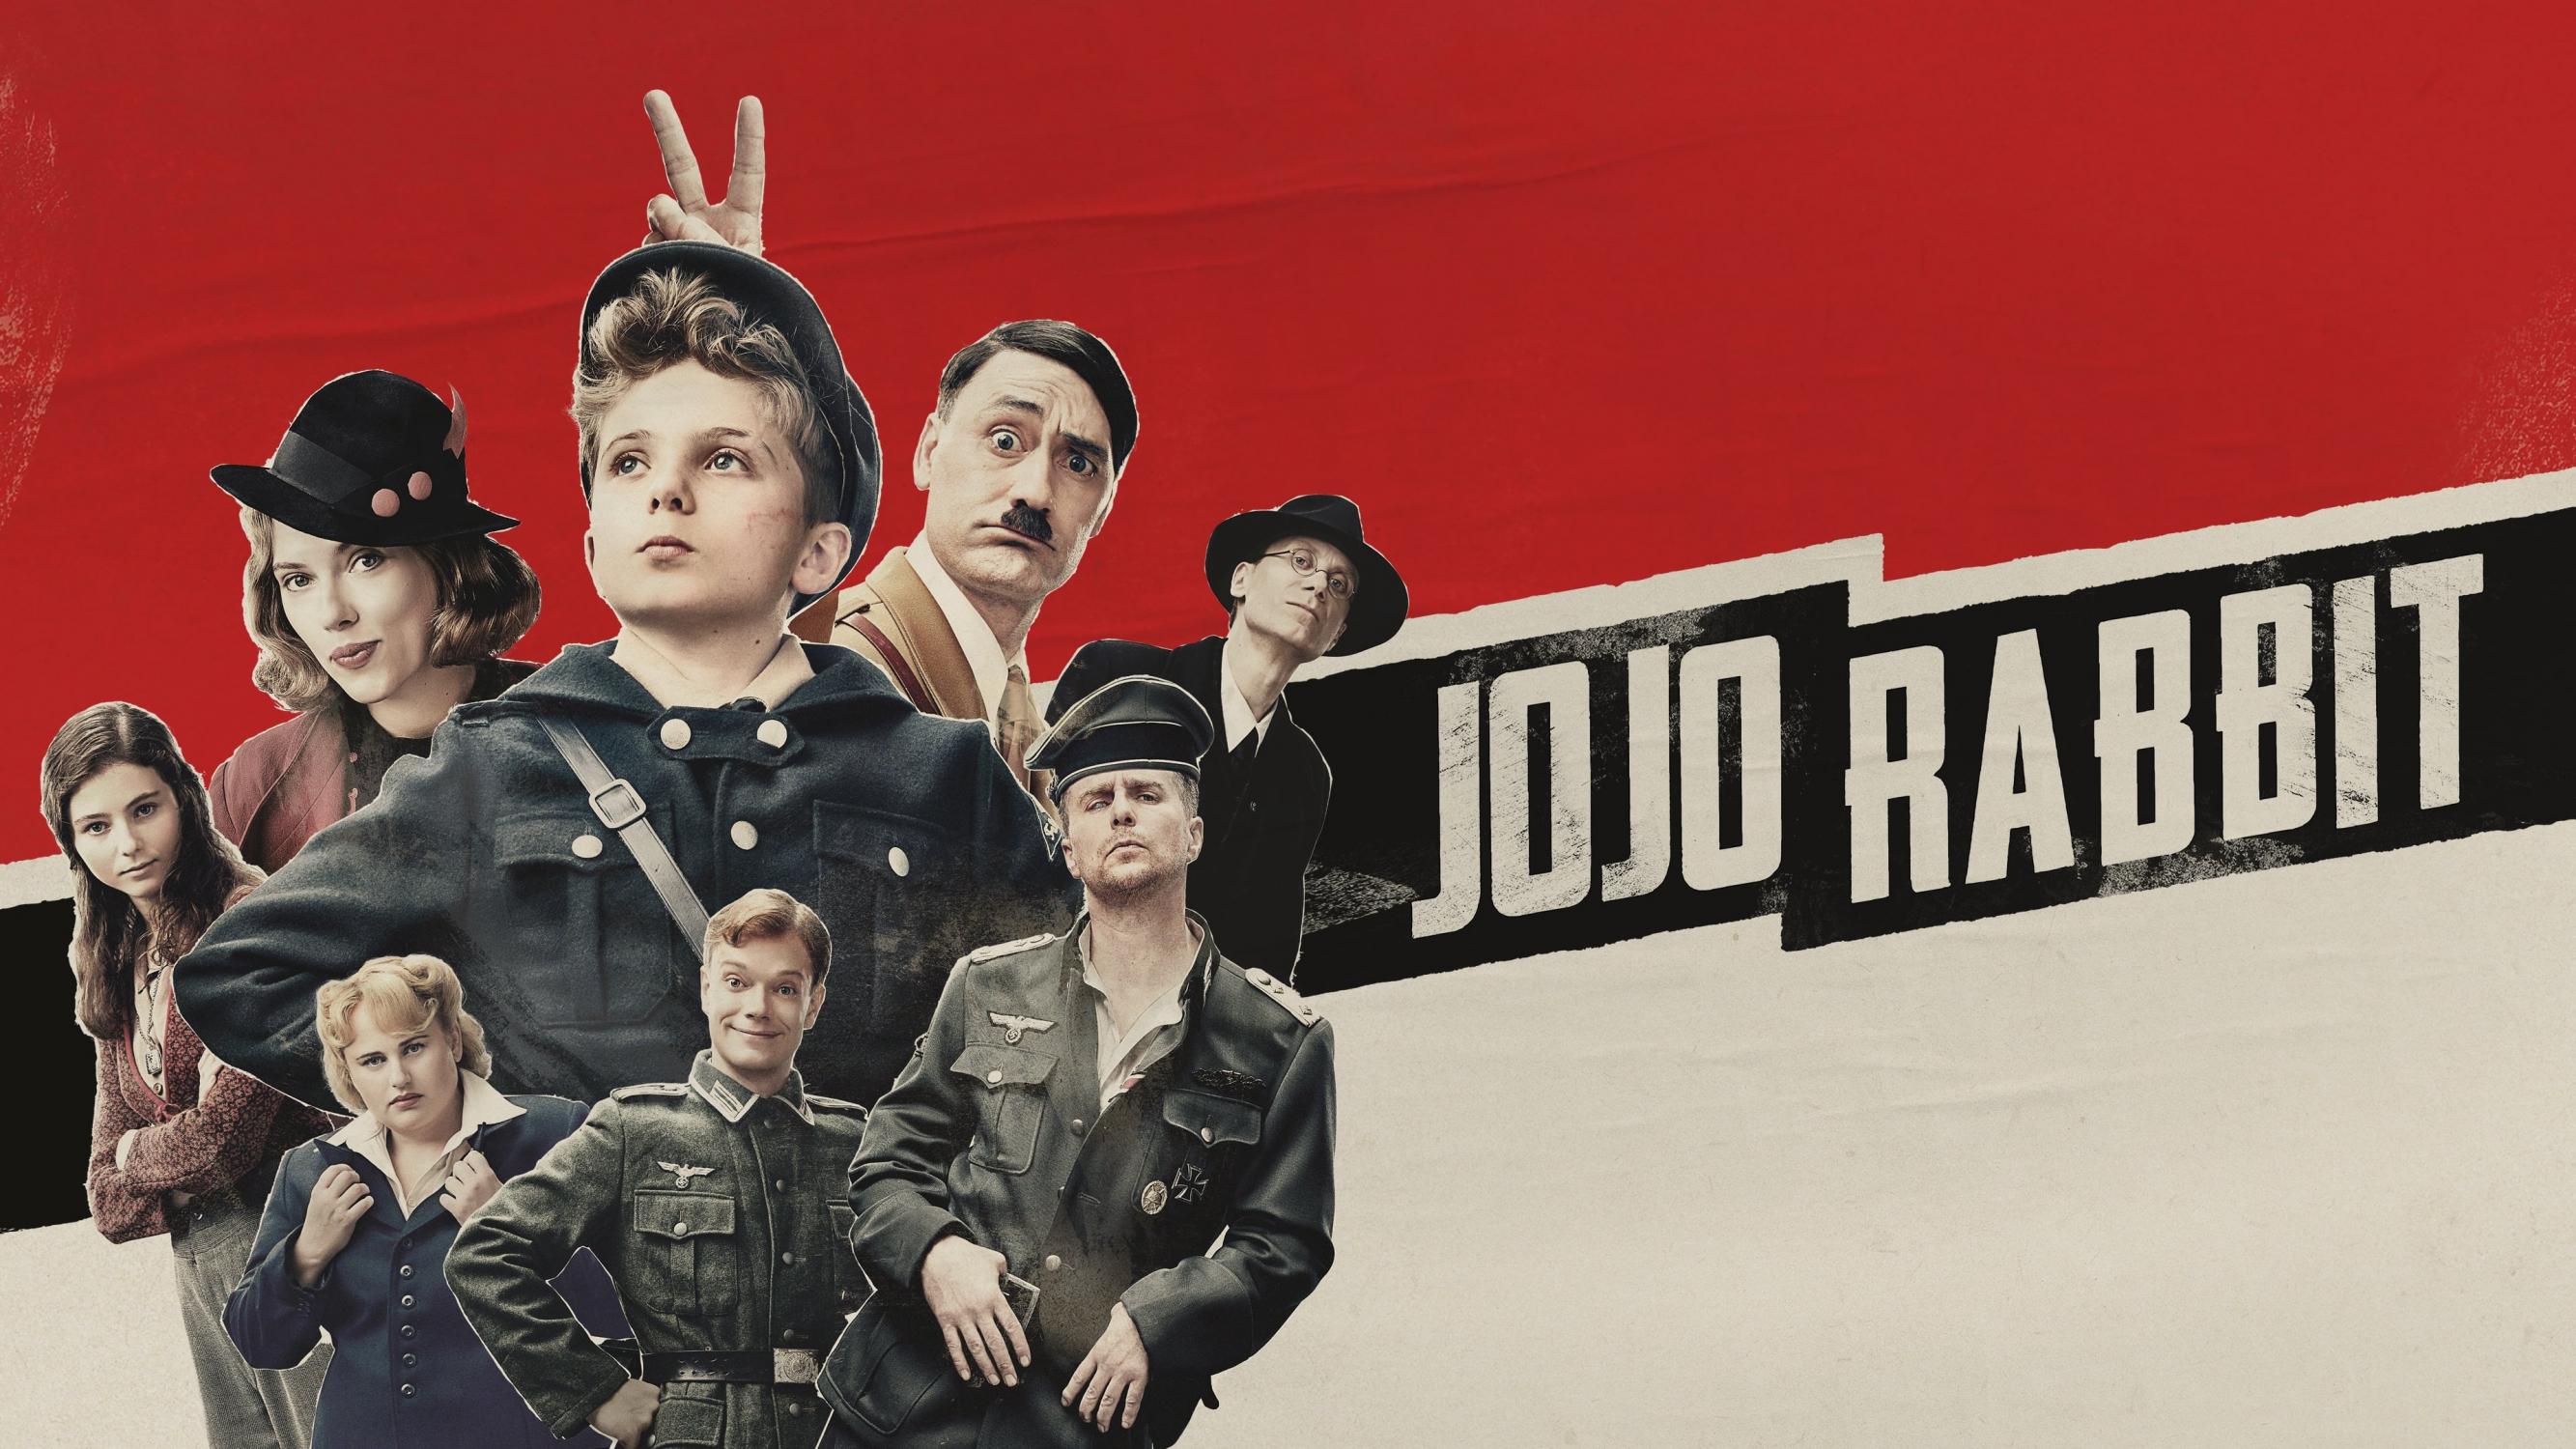 Jojo Rabbit Poster >> Jojo Rabbit Movie Info And Showtimes In Trinidad And